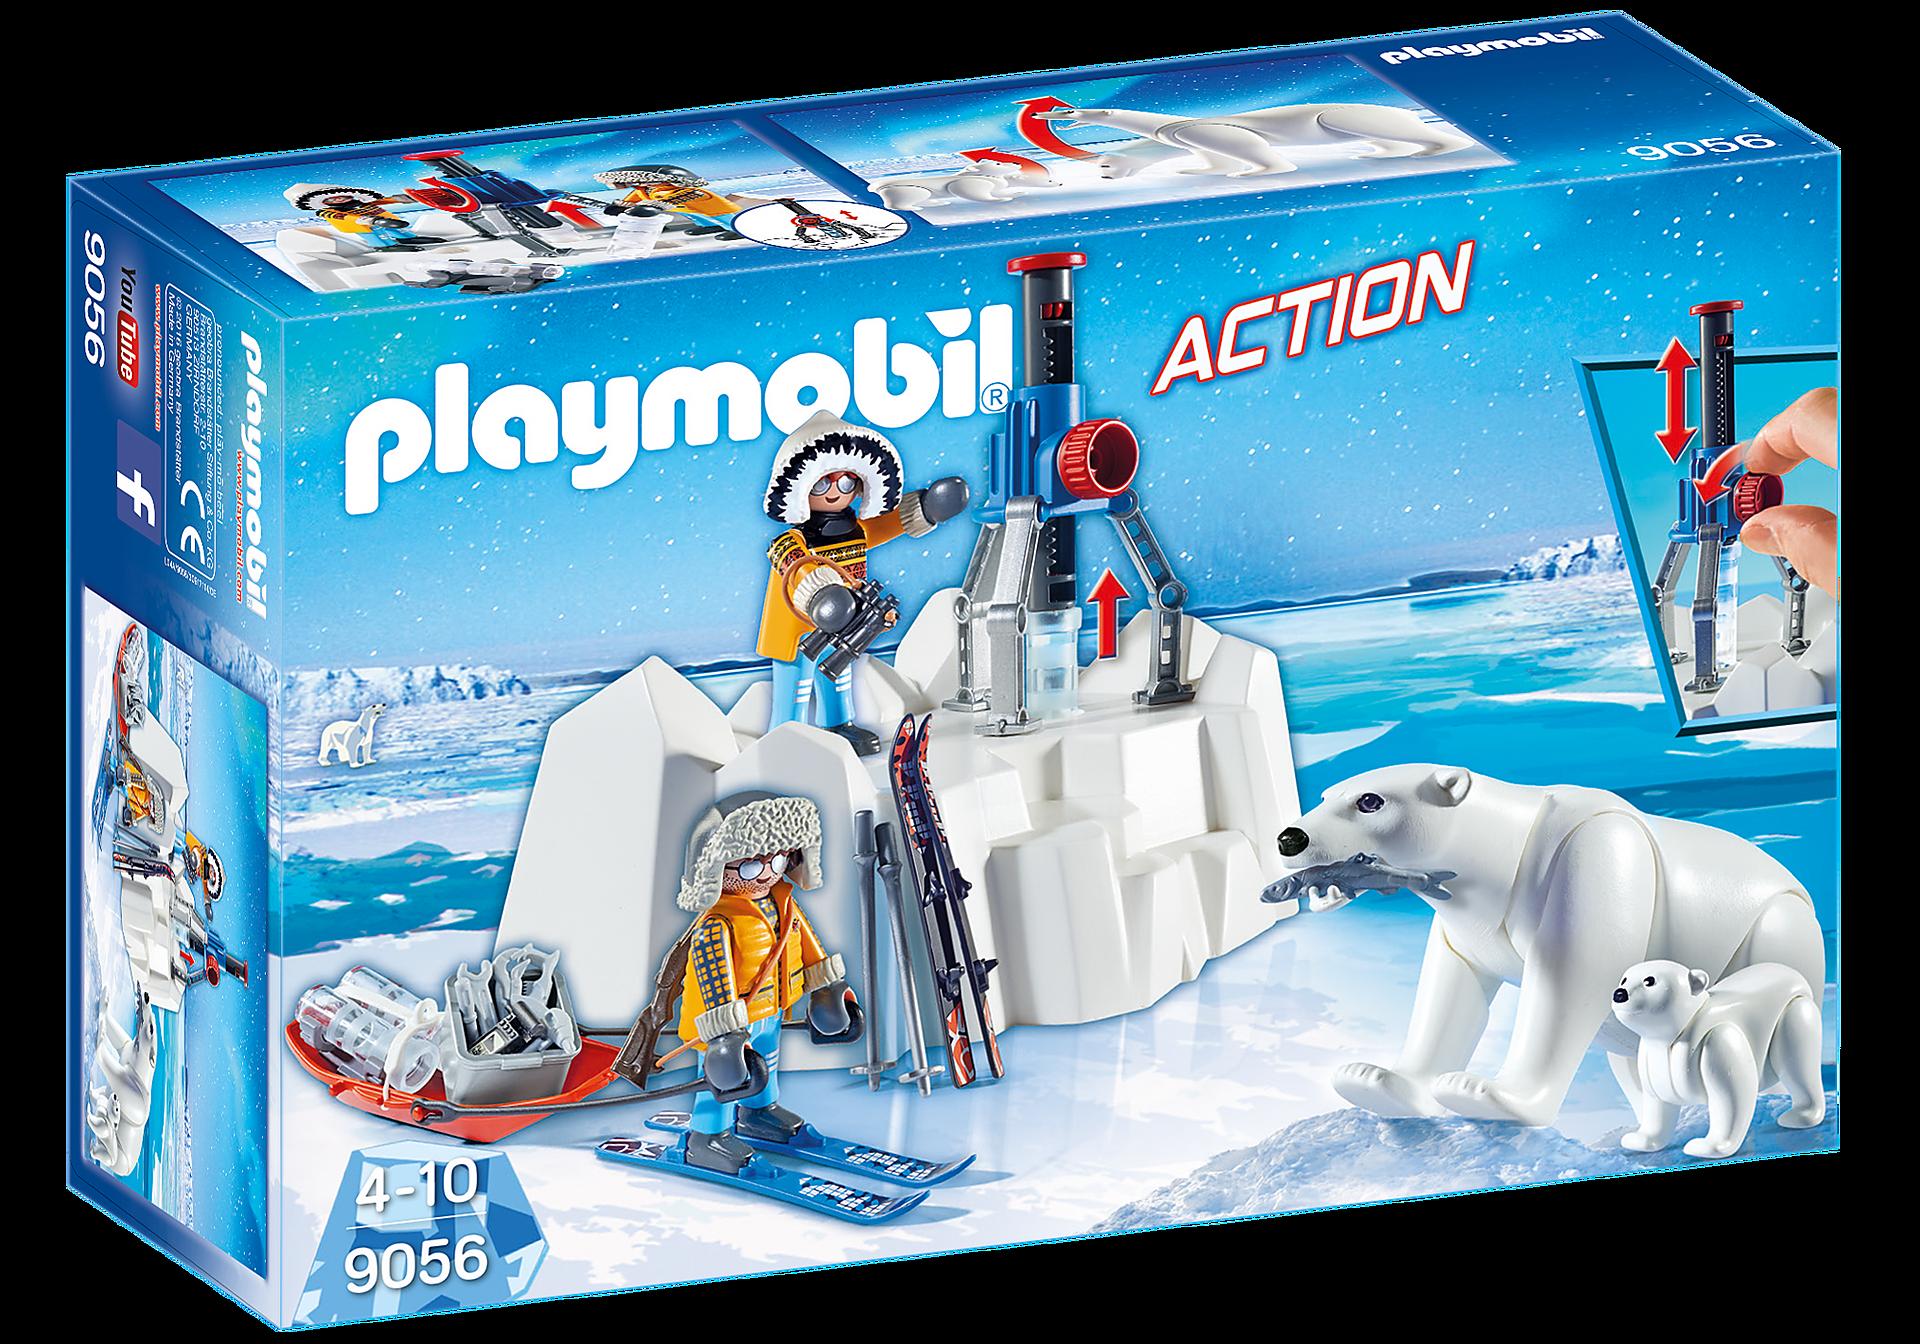 http://media.playmobil.com/i/playmobil/9056_product_box_front/Poolreizigers met ijsberen